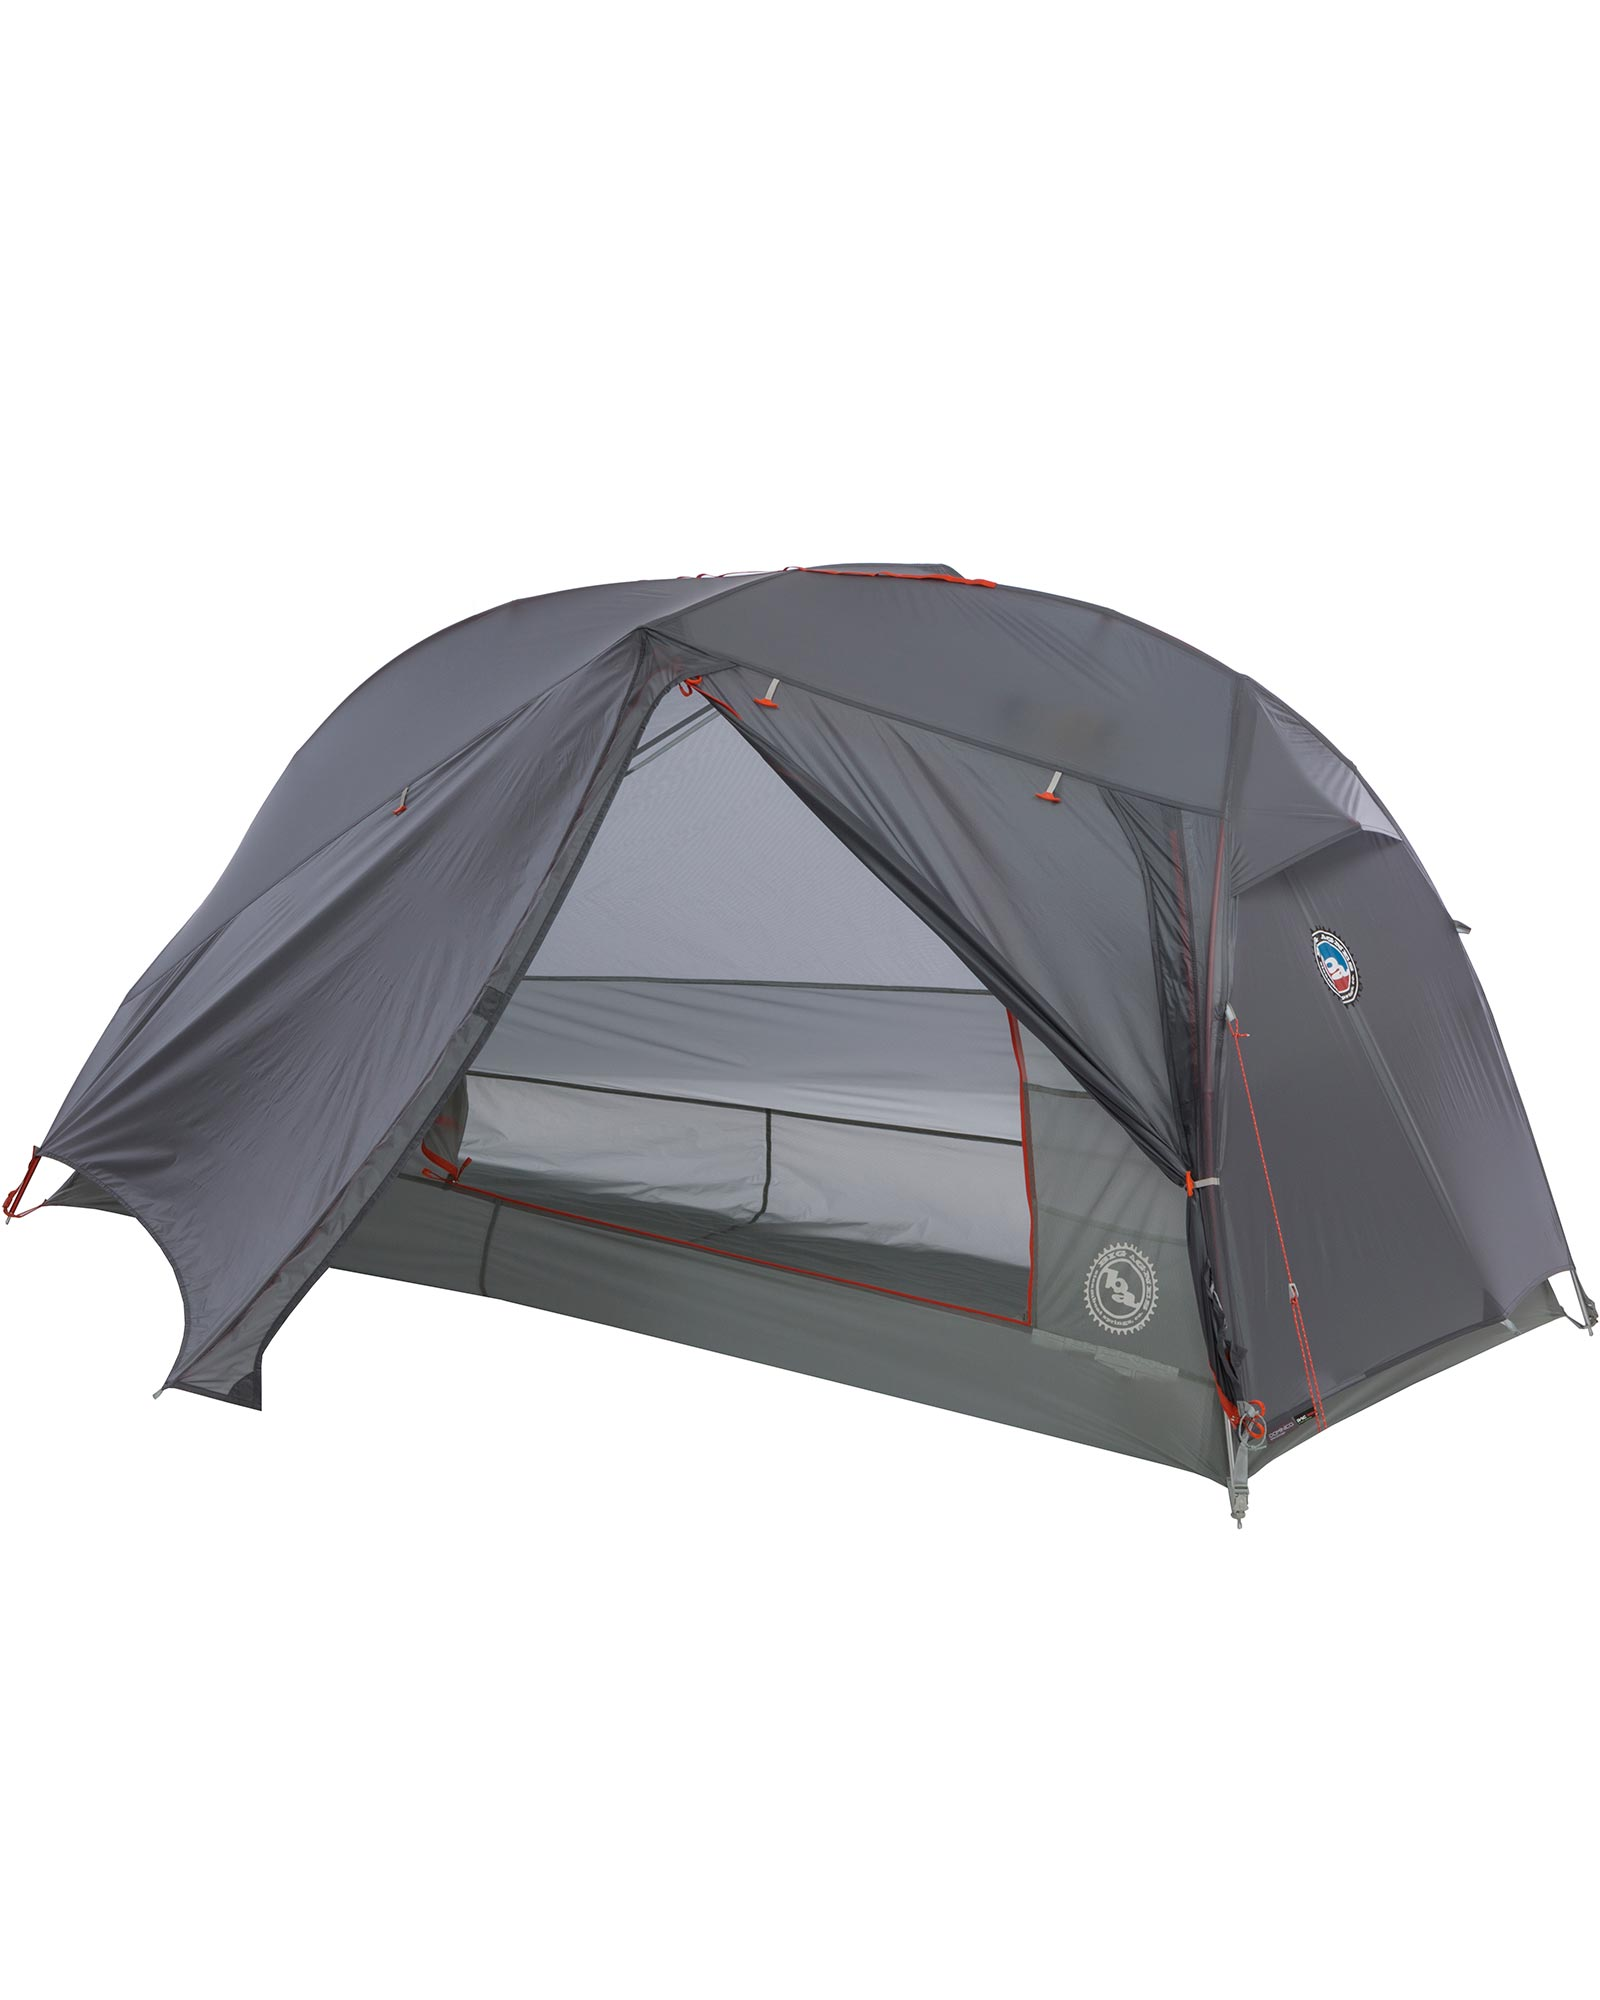 Big Agnes Copper Spur HV UL1 Bikepack Tent 0